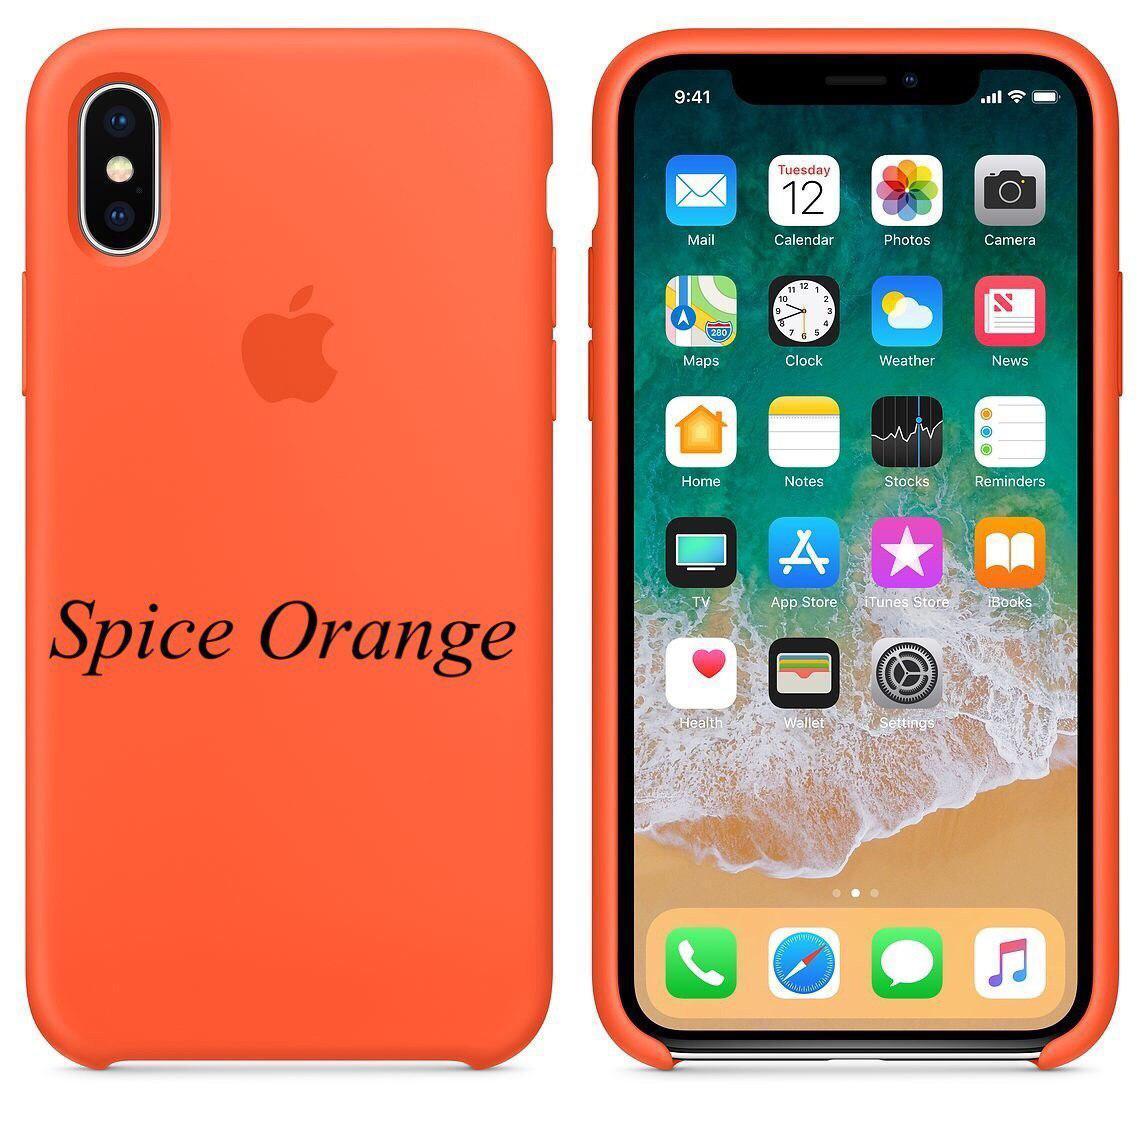 "APPLE SILICON CASE IPHONE X "" SPICE ORANGE """